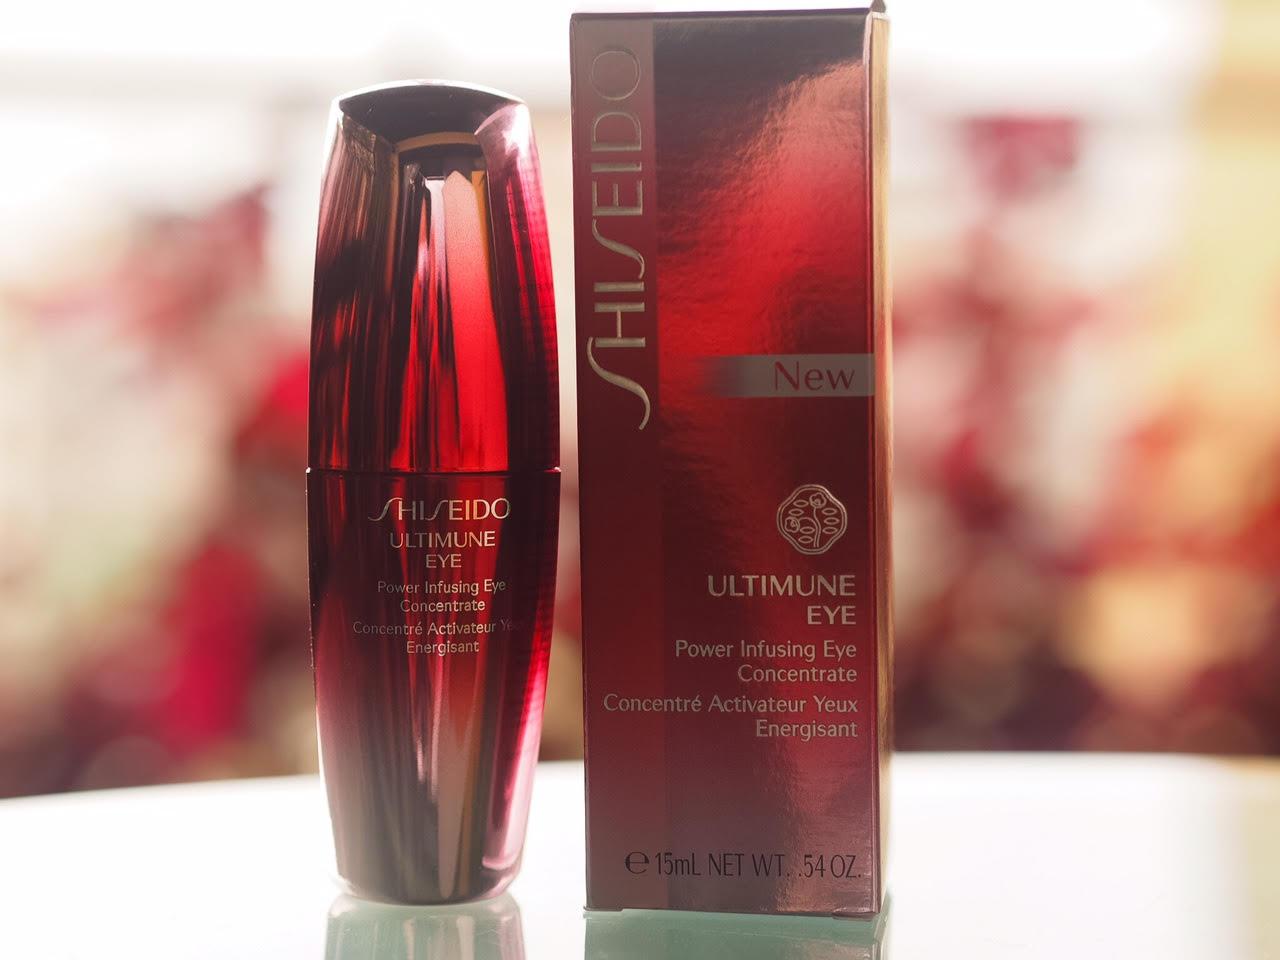 Shiseido Ultimune eyes review